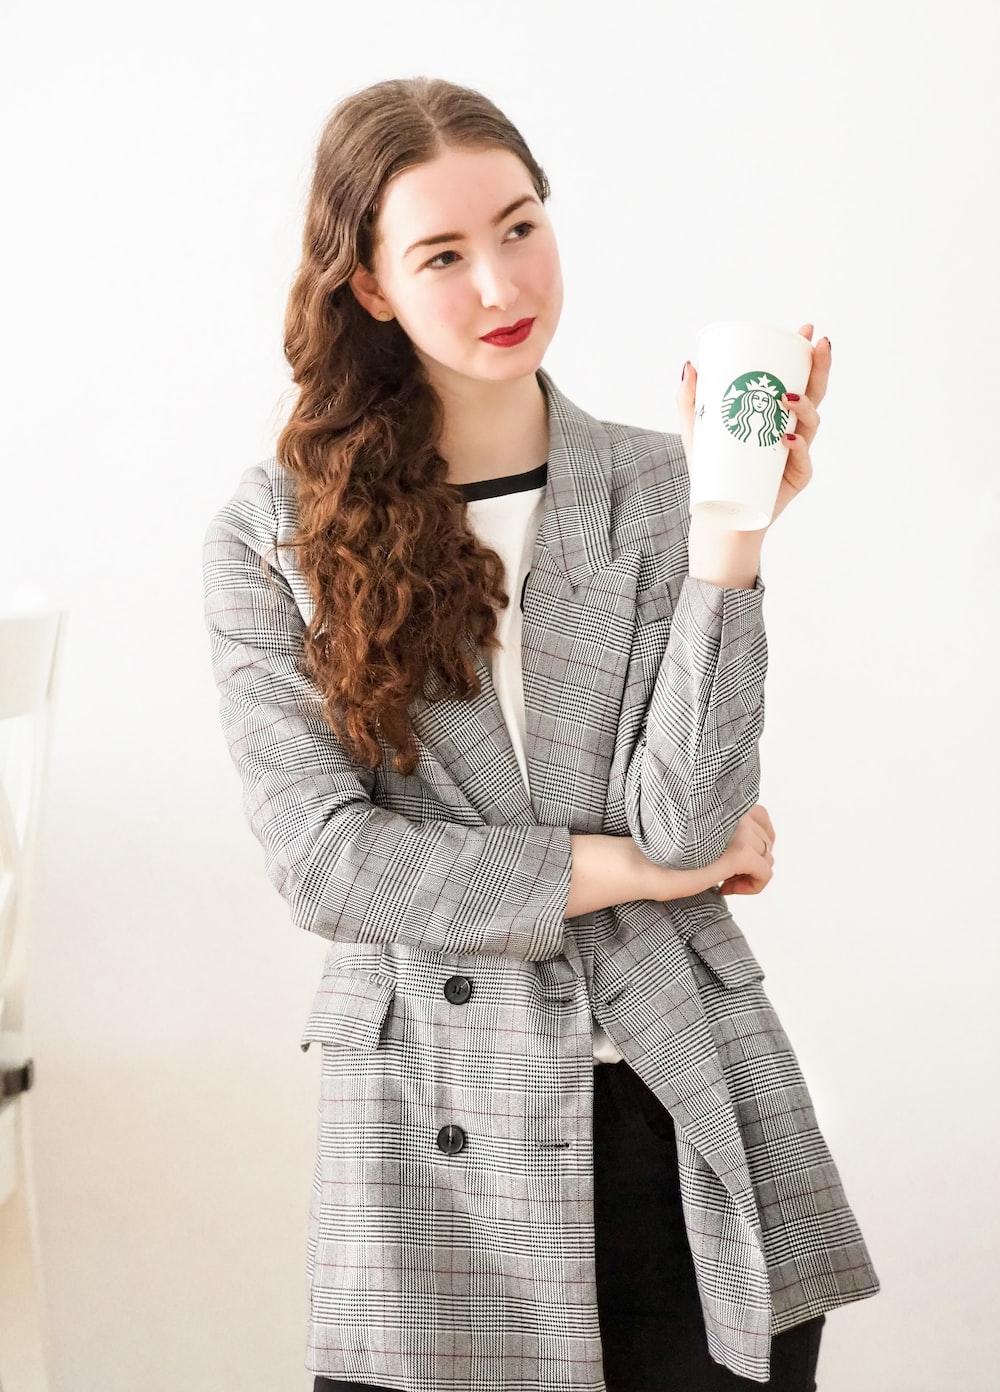 woman in gray coat holding white ceramic mug